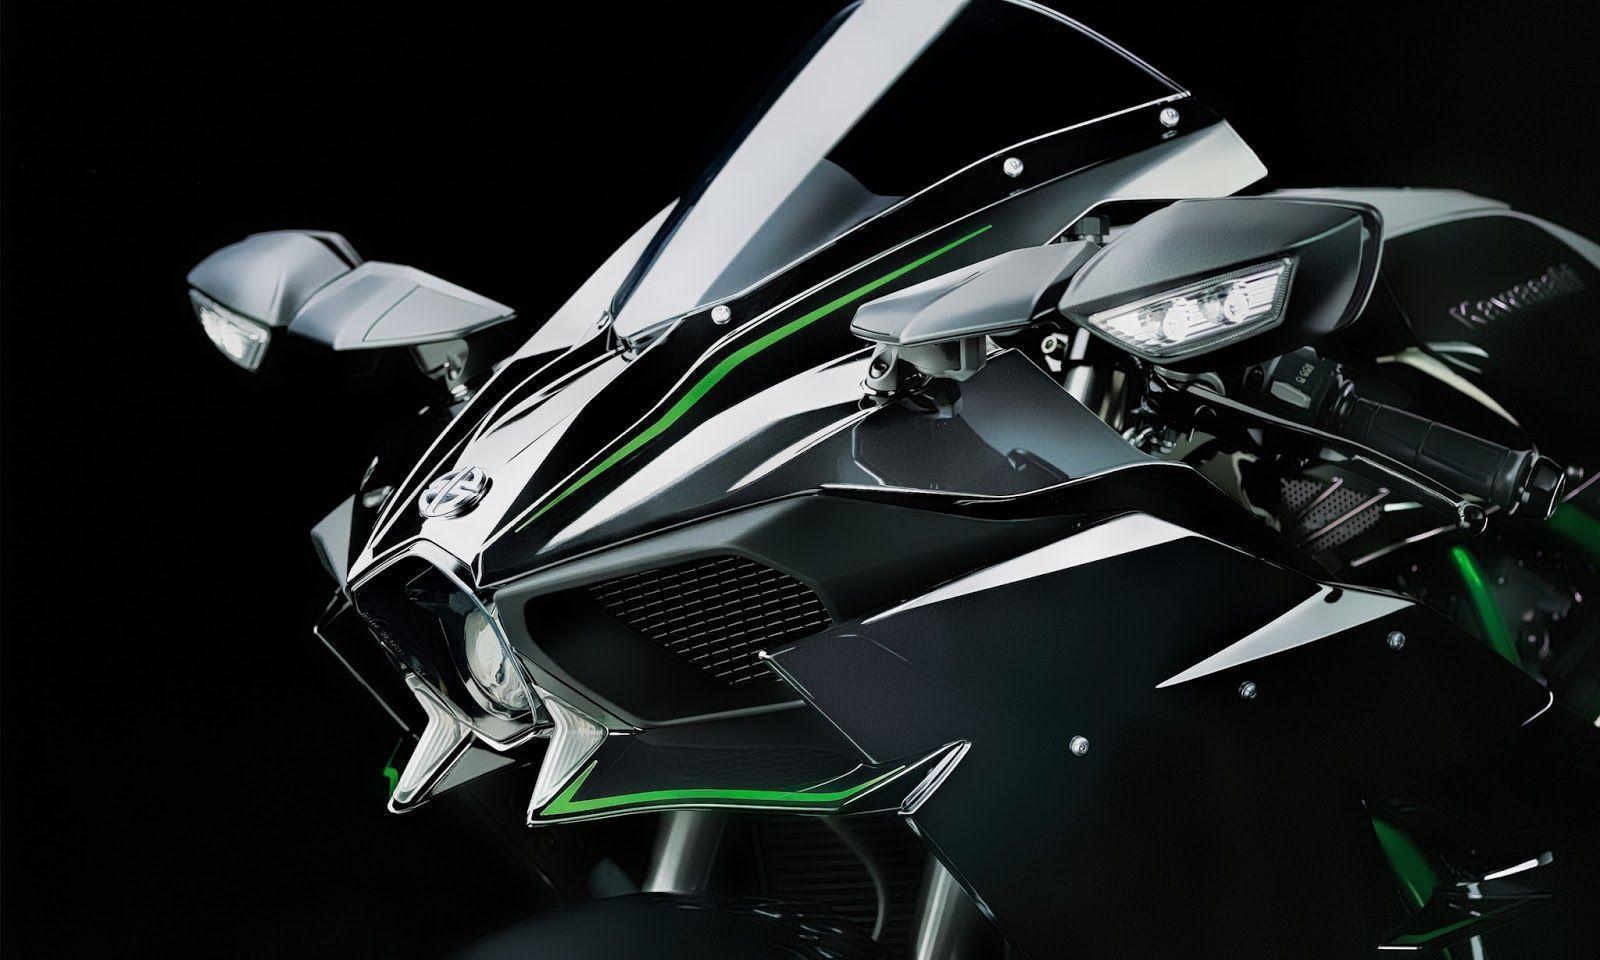 Kawasaki Ninja H2R HD Wallpapers | HD Wallpapers (High Definition ...